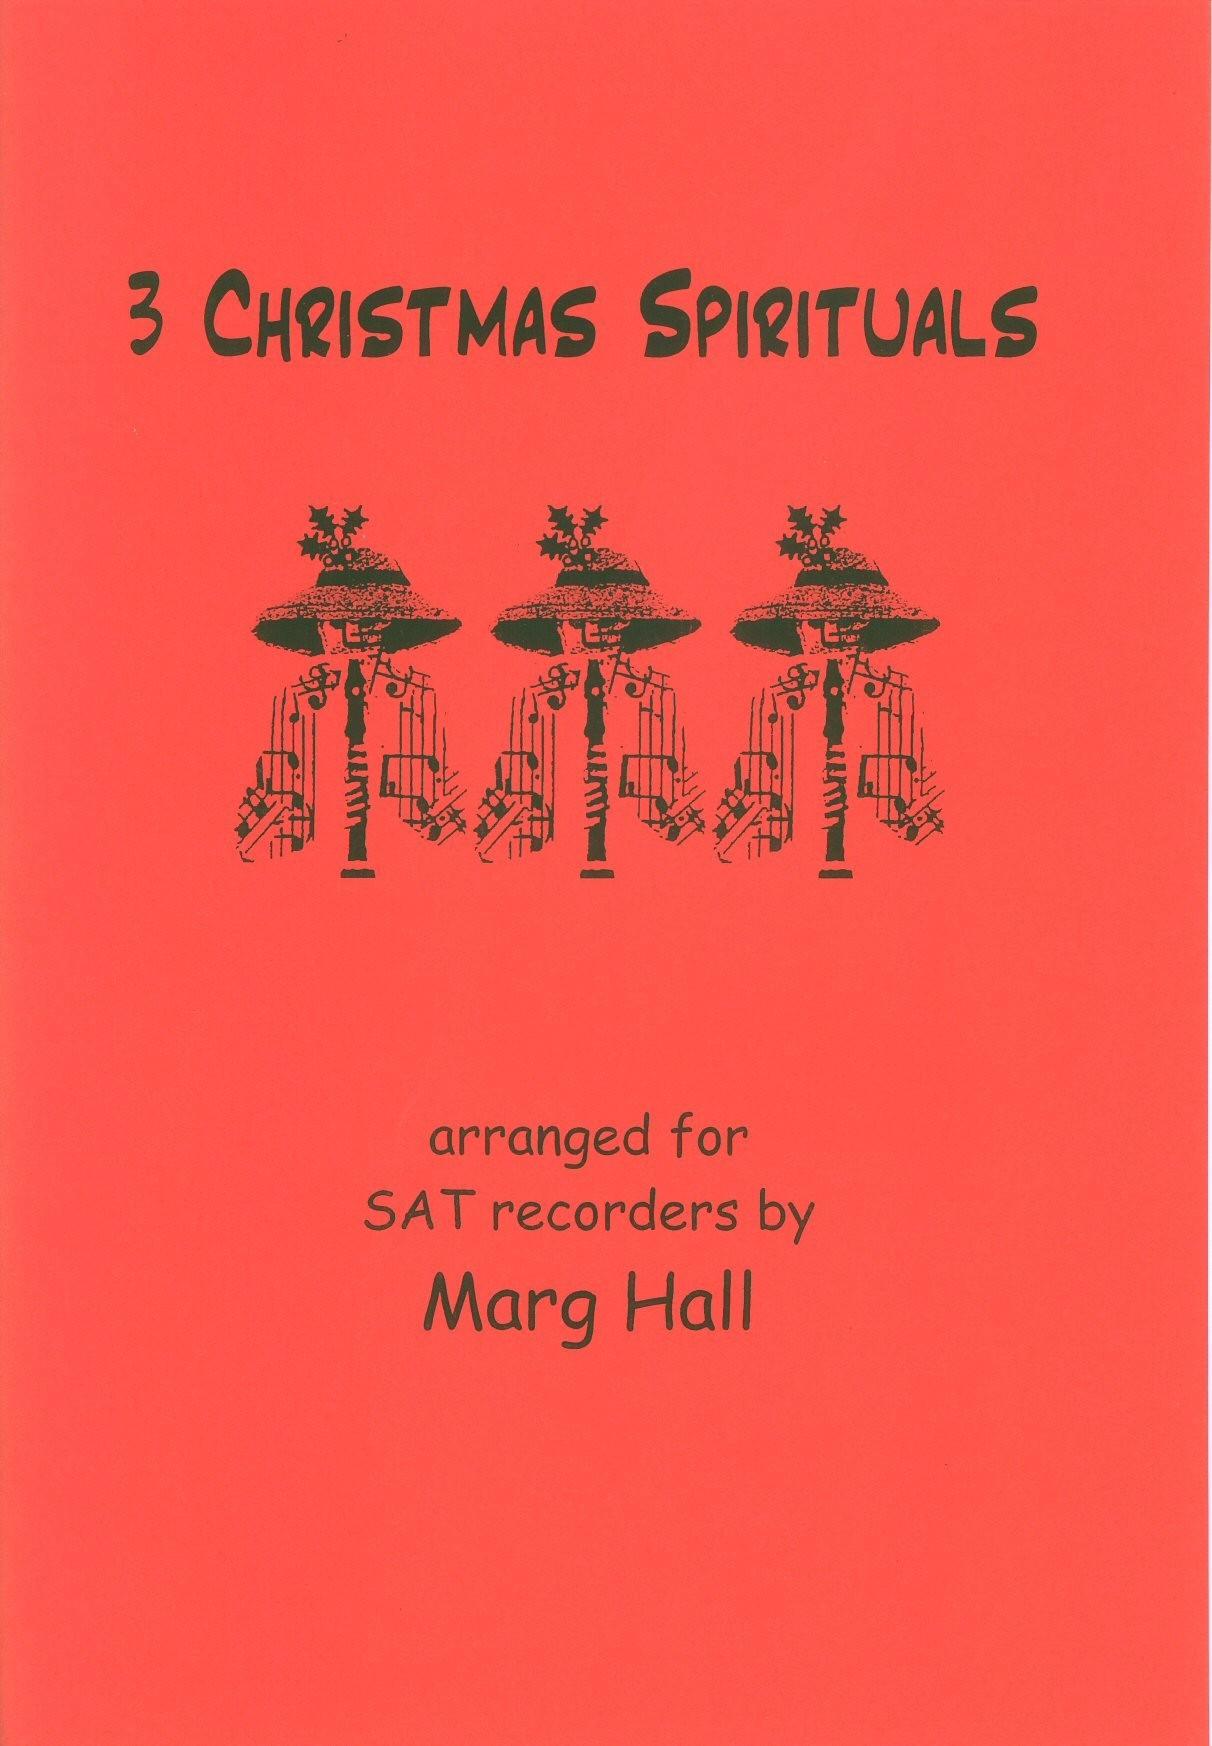 Three Christmas Spirituals - Orpheus Music